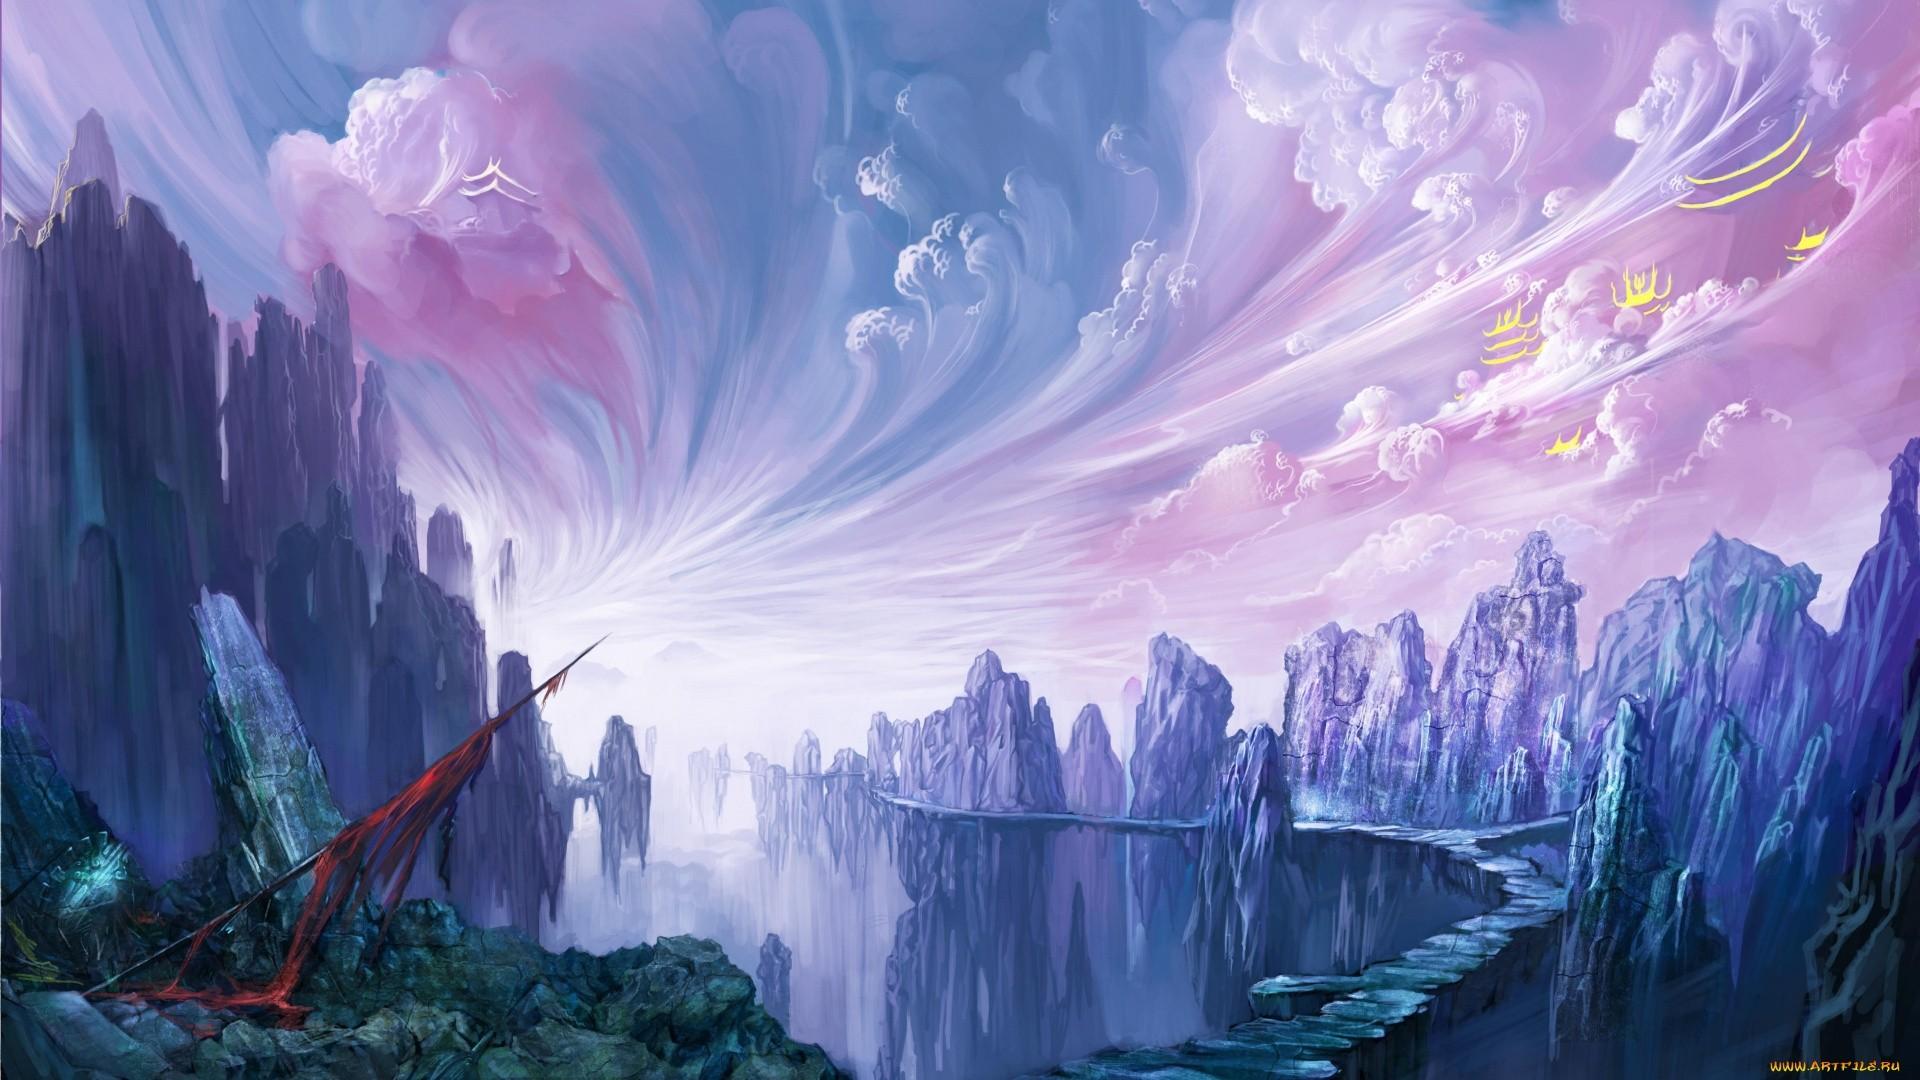 Magic Wallpaper image hd